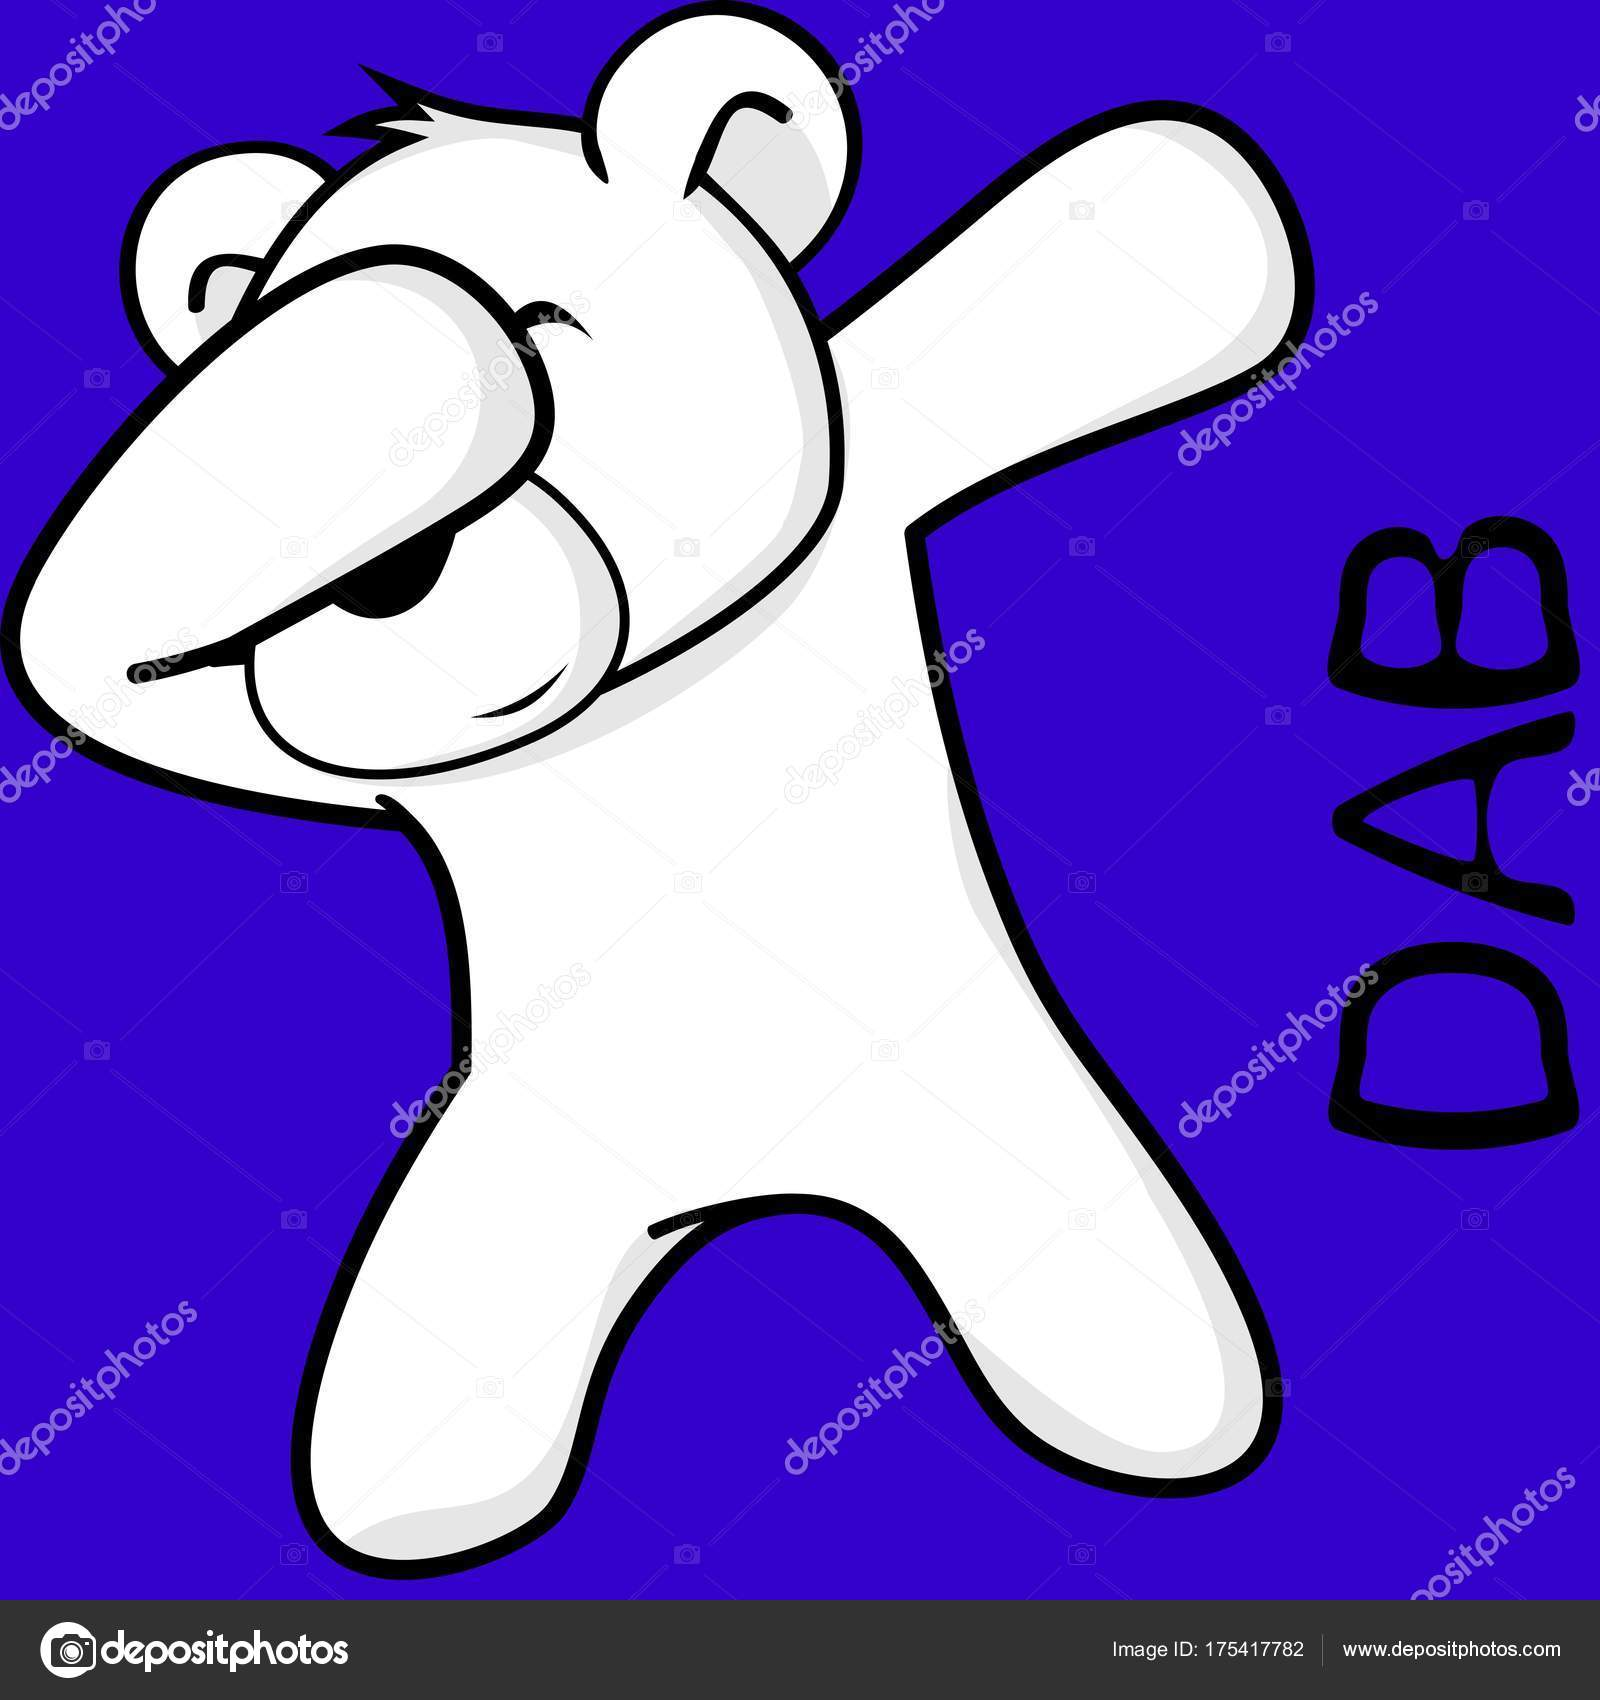 Dibujo Oso Polar Infantil Dab Superficies Pose Oso Polar Nino